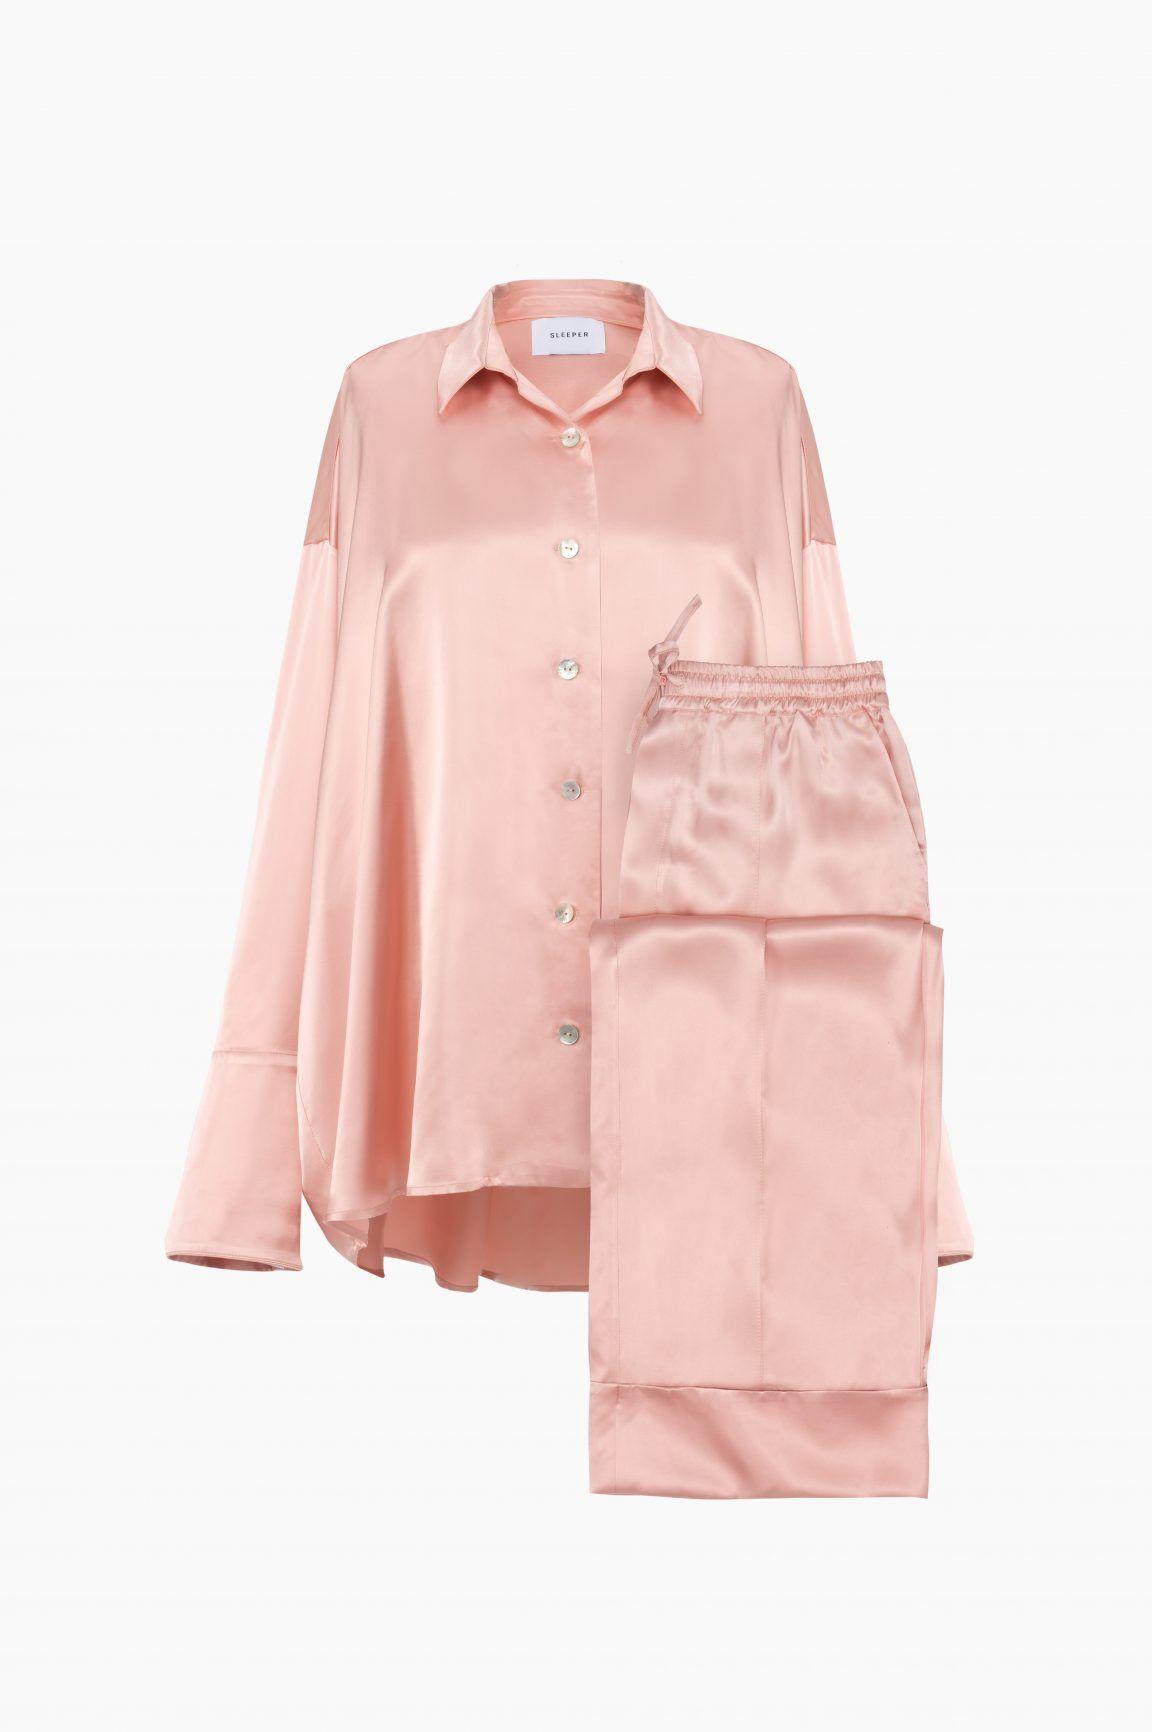 JULES SILK TOPLuxury silk satin top Ethical silk sleepwearModern Silk sleepwearSilk pajamasLounge topContemporary fashionSteel grey